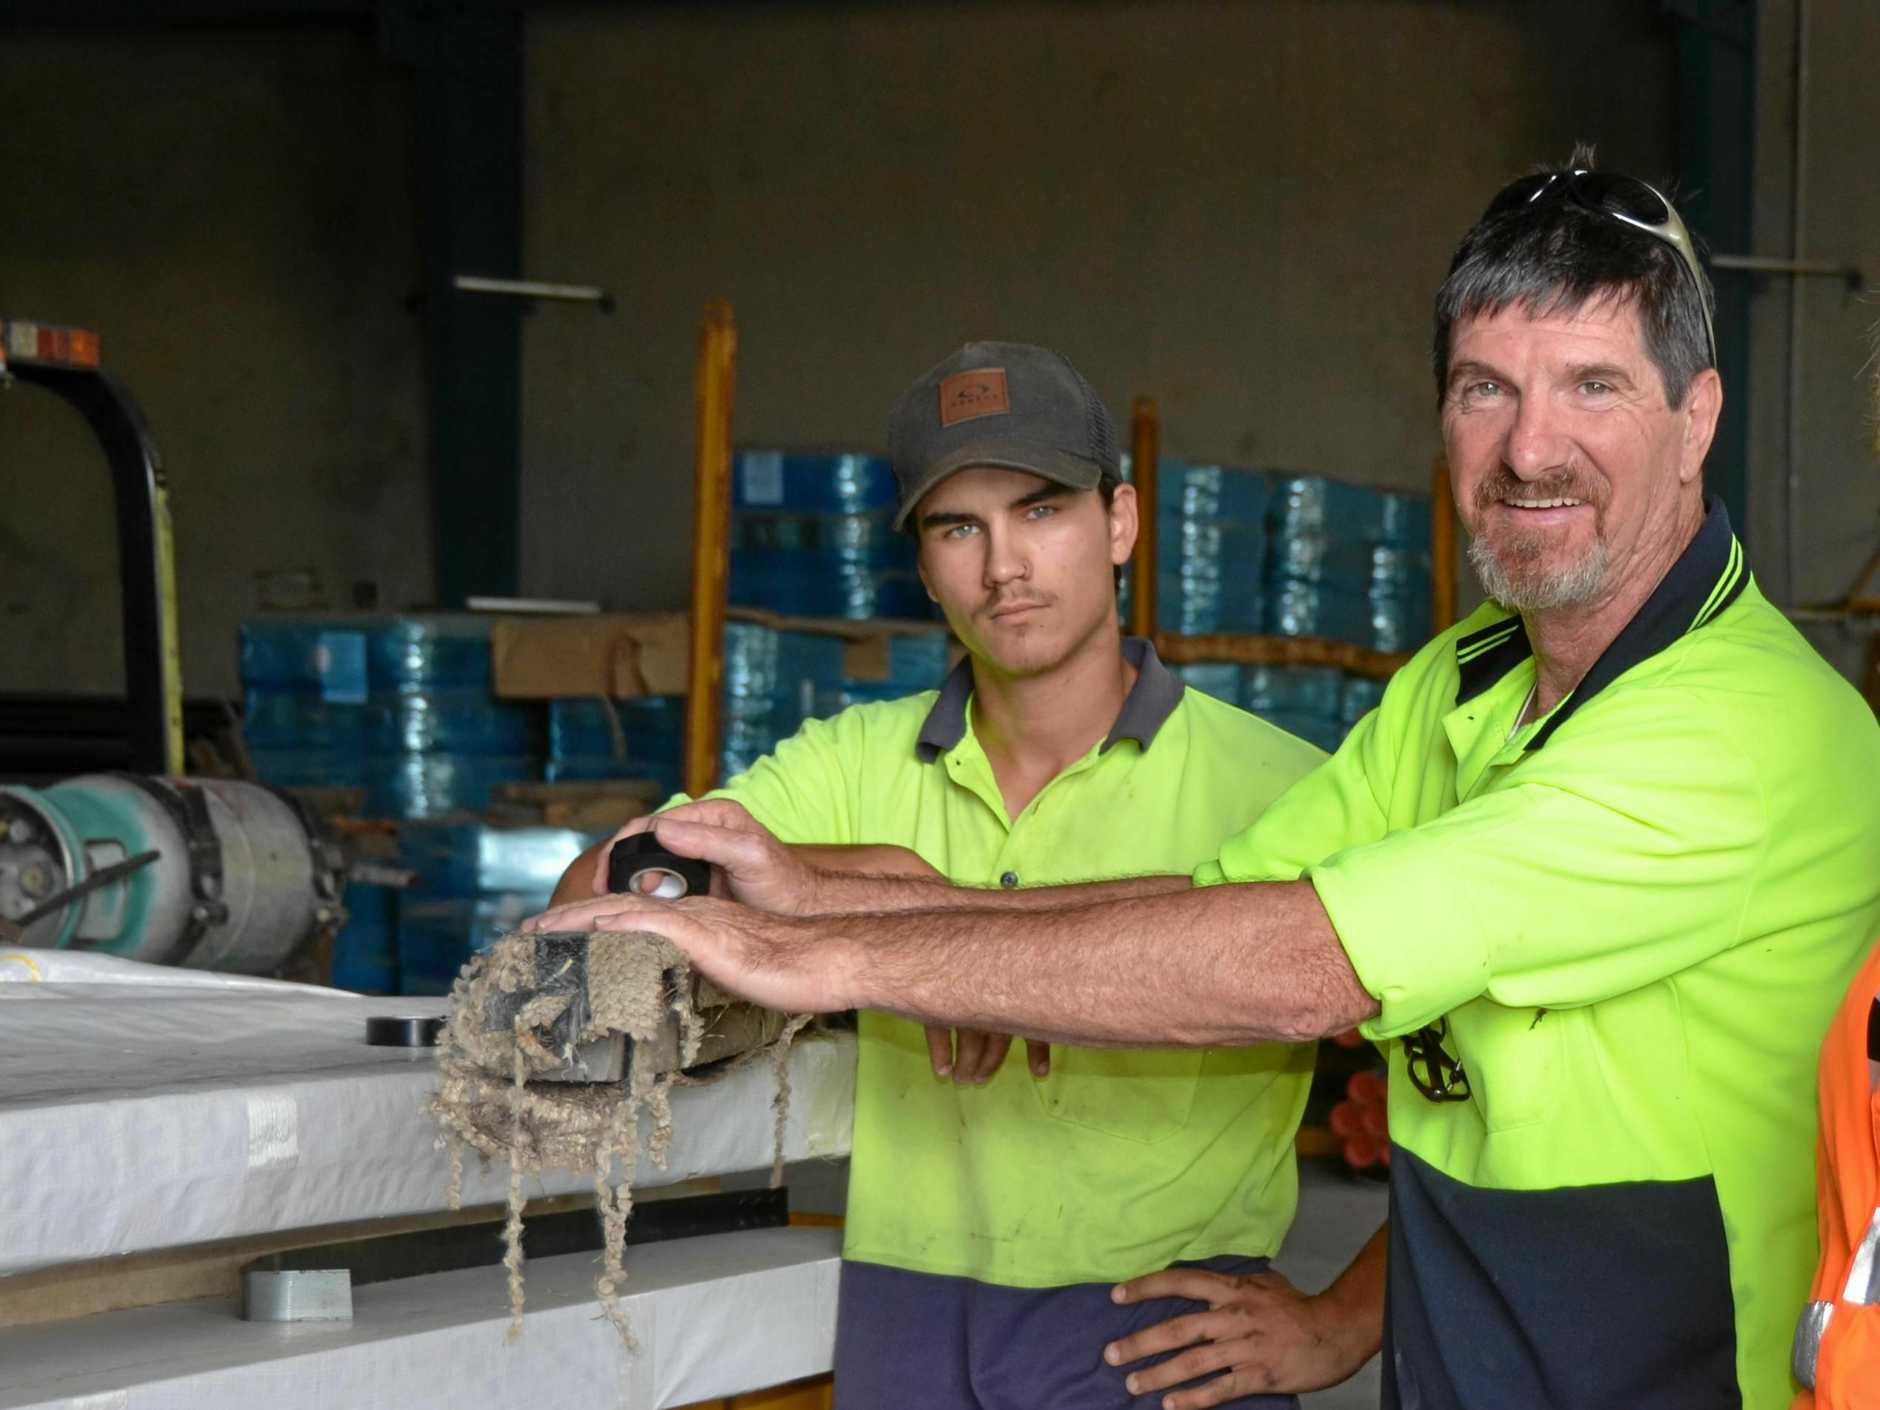 Jack Dickson and Paul Brambling enjoy their work